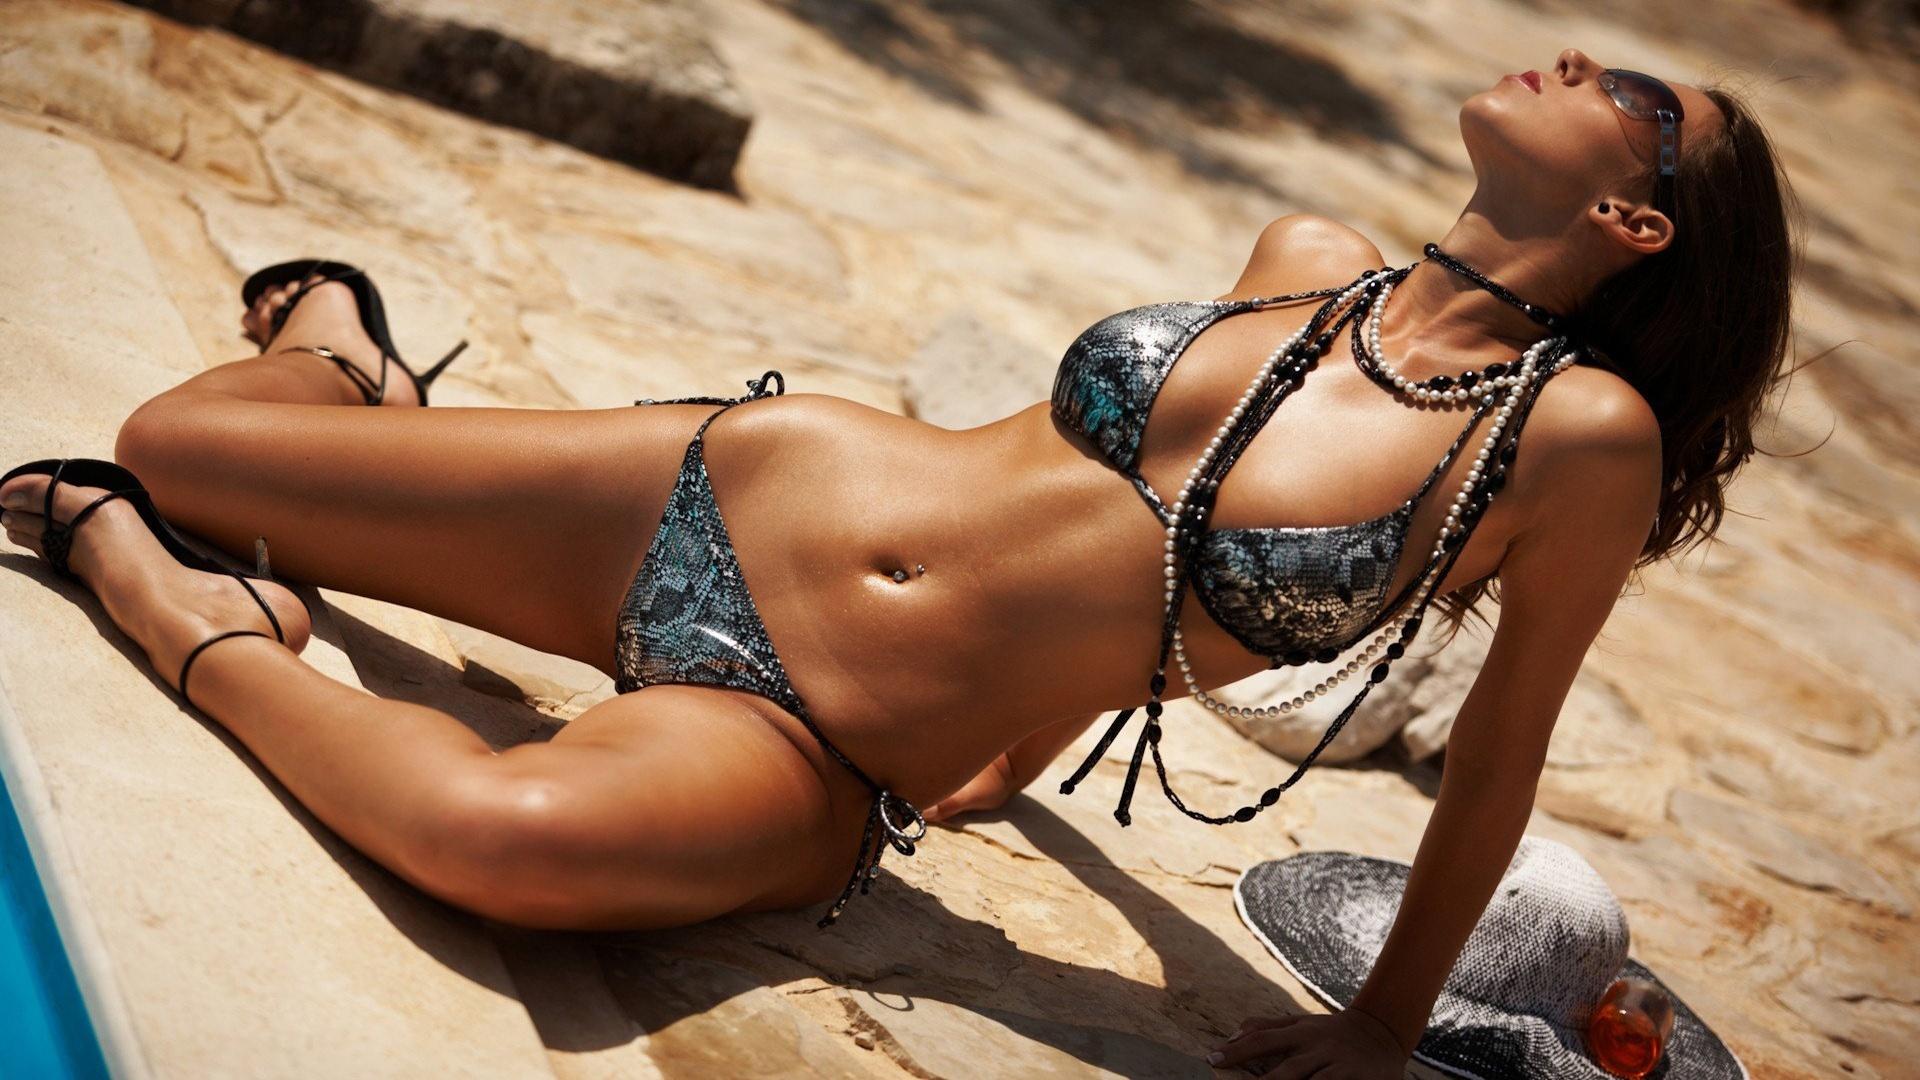 Instagram Sensation Natasha Oakley Flaunts Tanned Physique In Sexy Halterneck Bikini